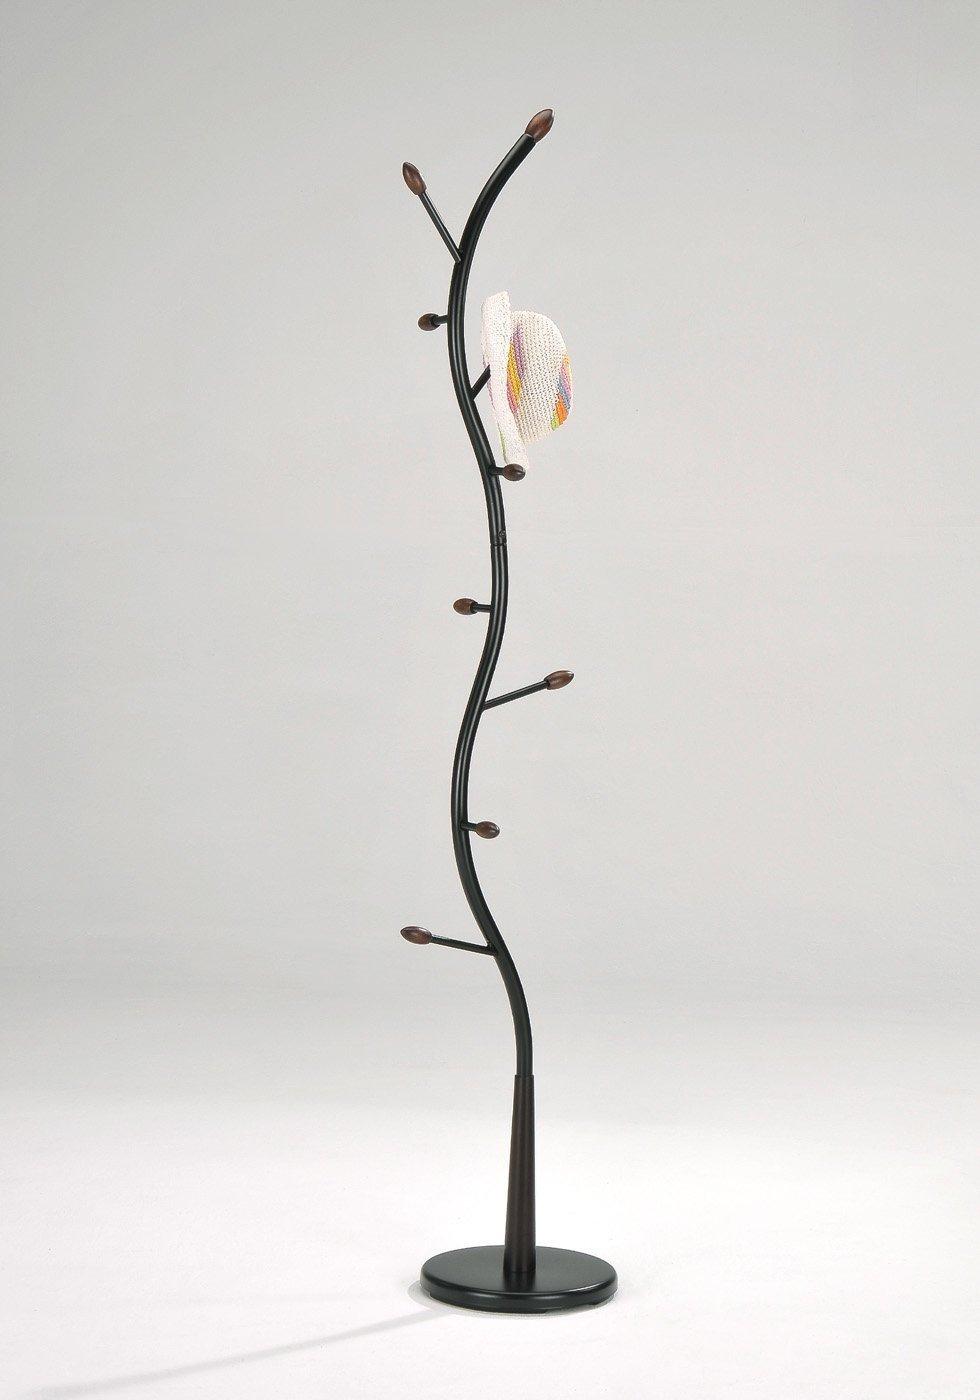 1 X Black Metal Walnut Wood Hall Tree Coat Hat Rack by eHomeProducts